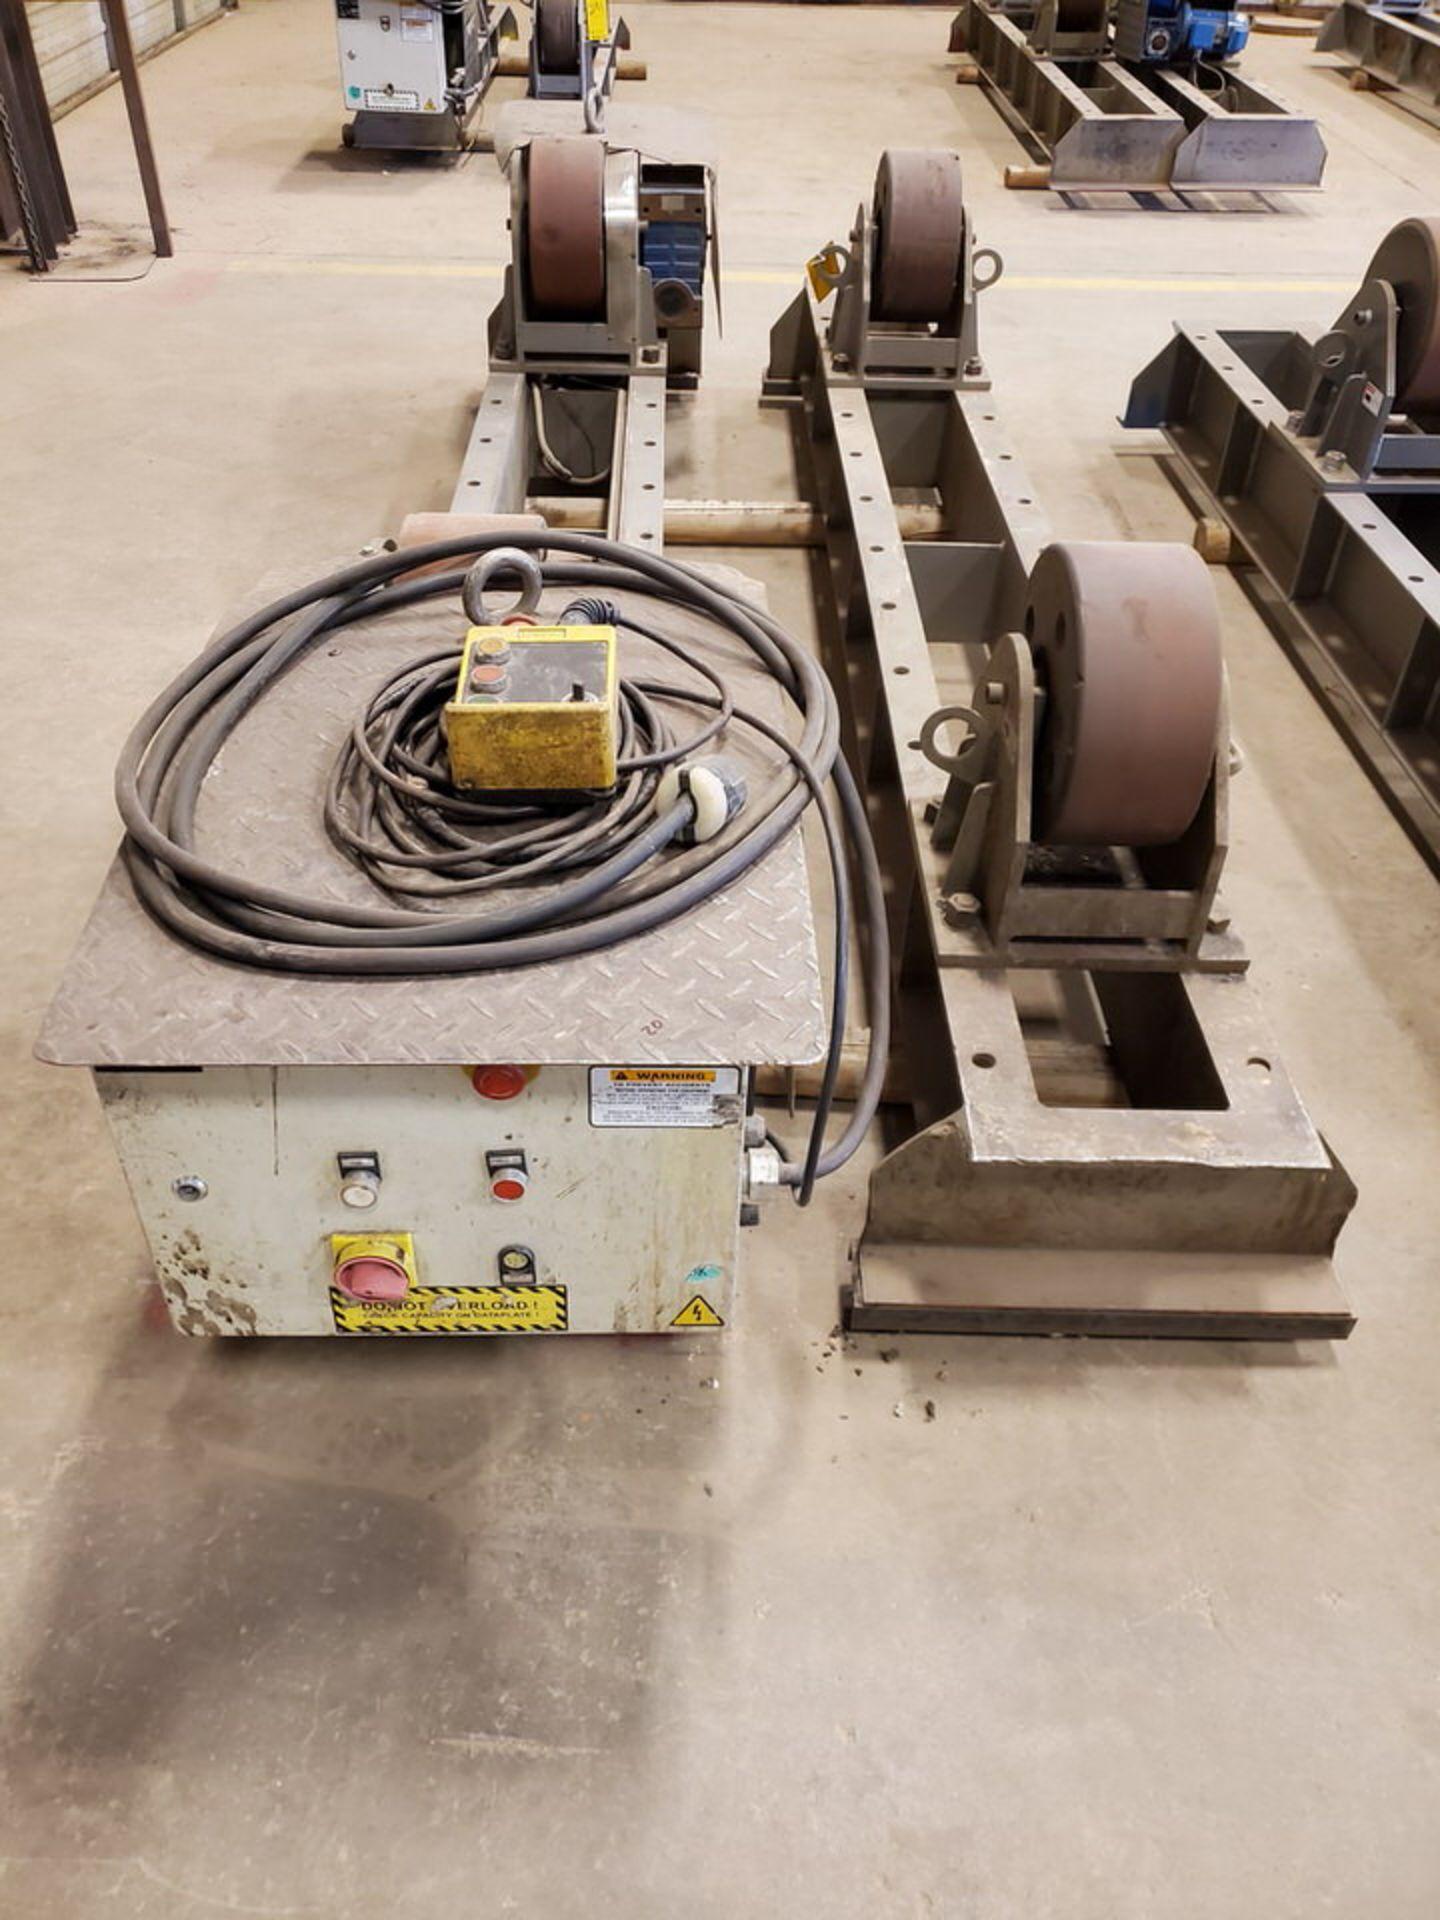 "Profax TR-40000 Turn Roll 20H Cap., 440V, 15A, 50/60HZ, 3PH, RPM: 0-1.7, 6"" Wheel Dia. - Image 5 of 8"